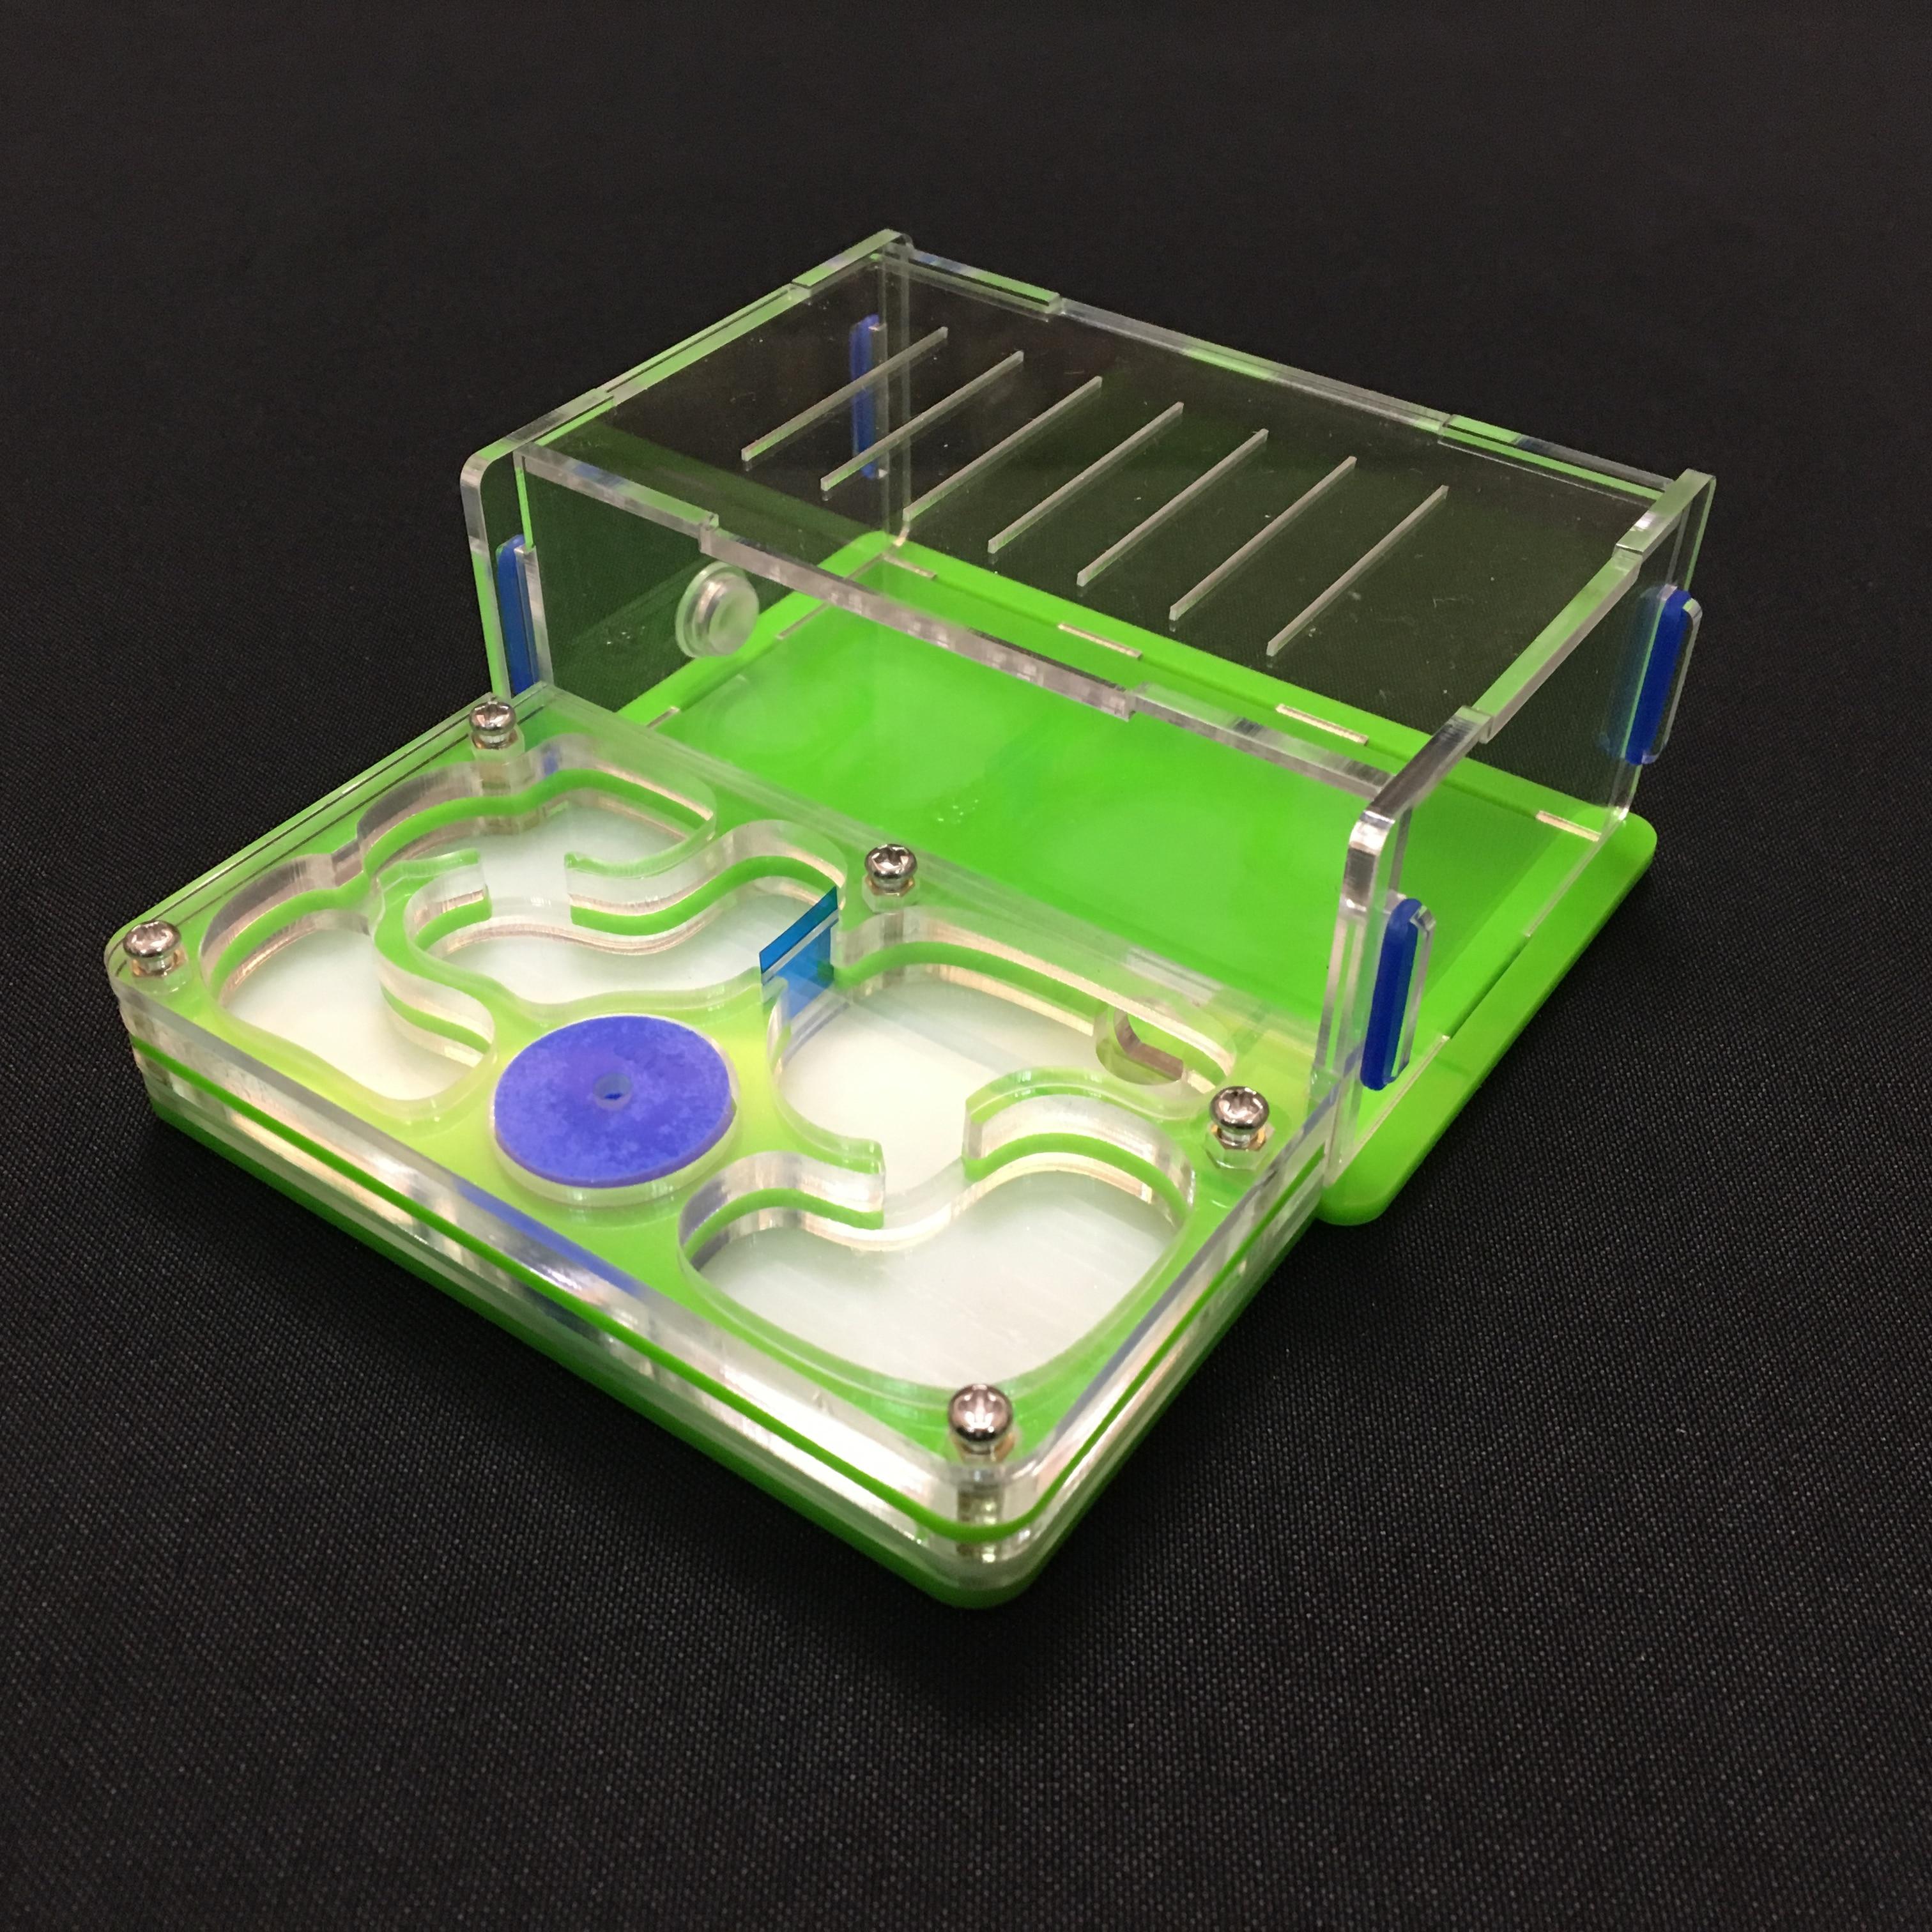 Ant Grape M Plane Moisture With Feeding Area Nestant Farm Fuse Box Acrylicinsect Villa Pet Advanced Mania For House Ants